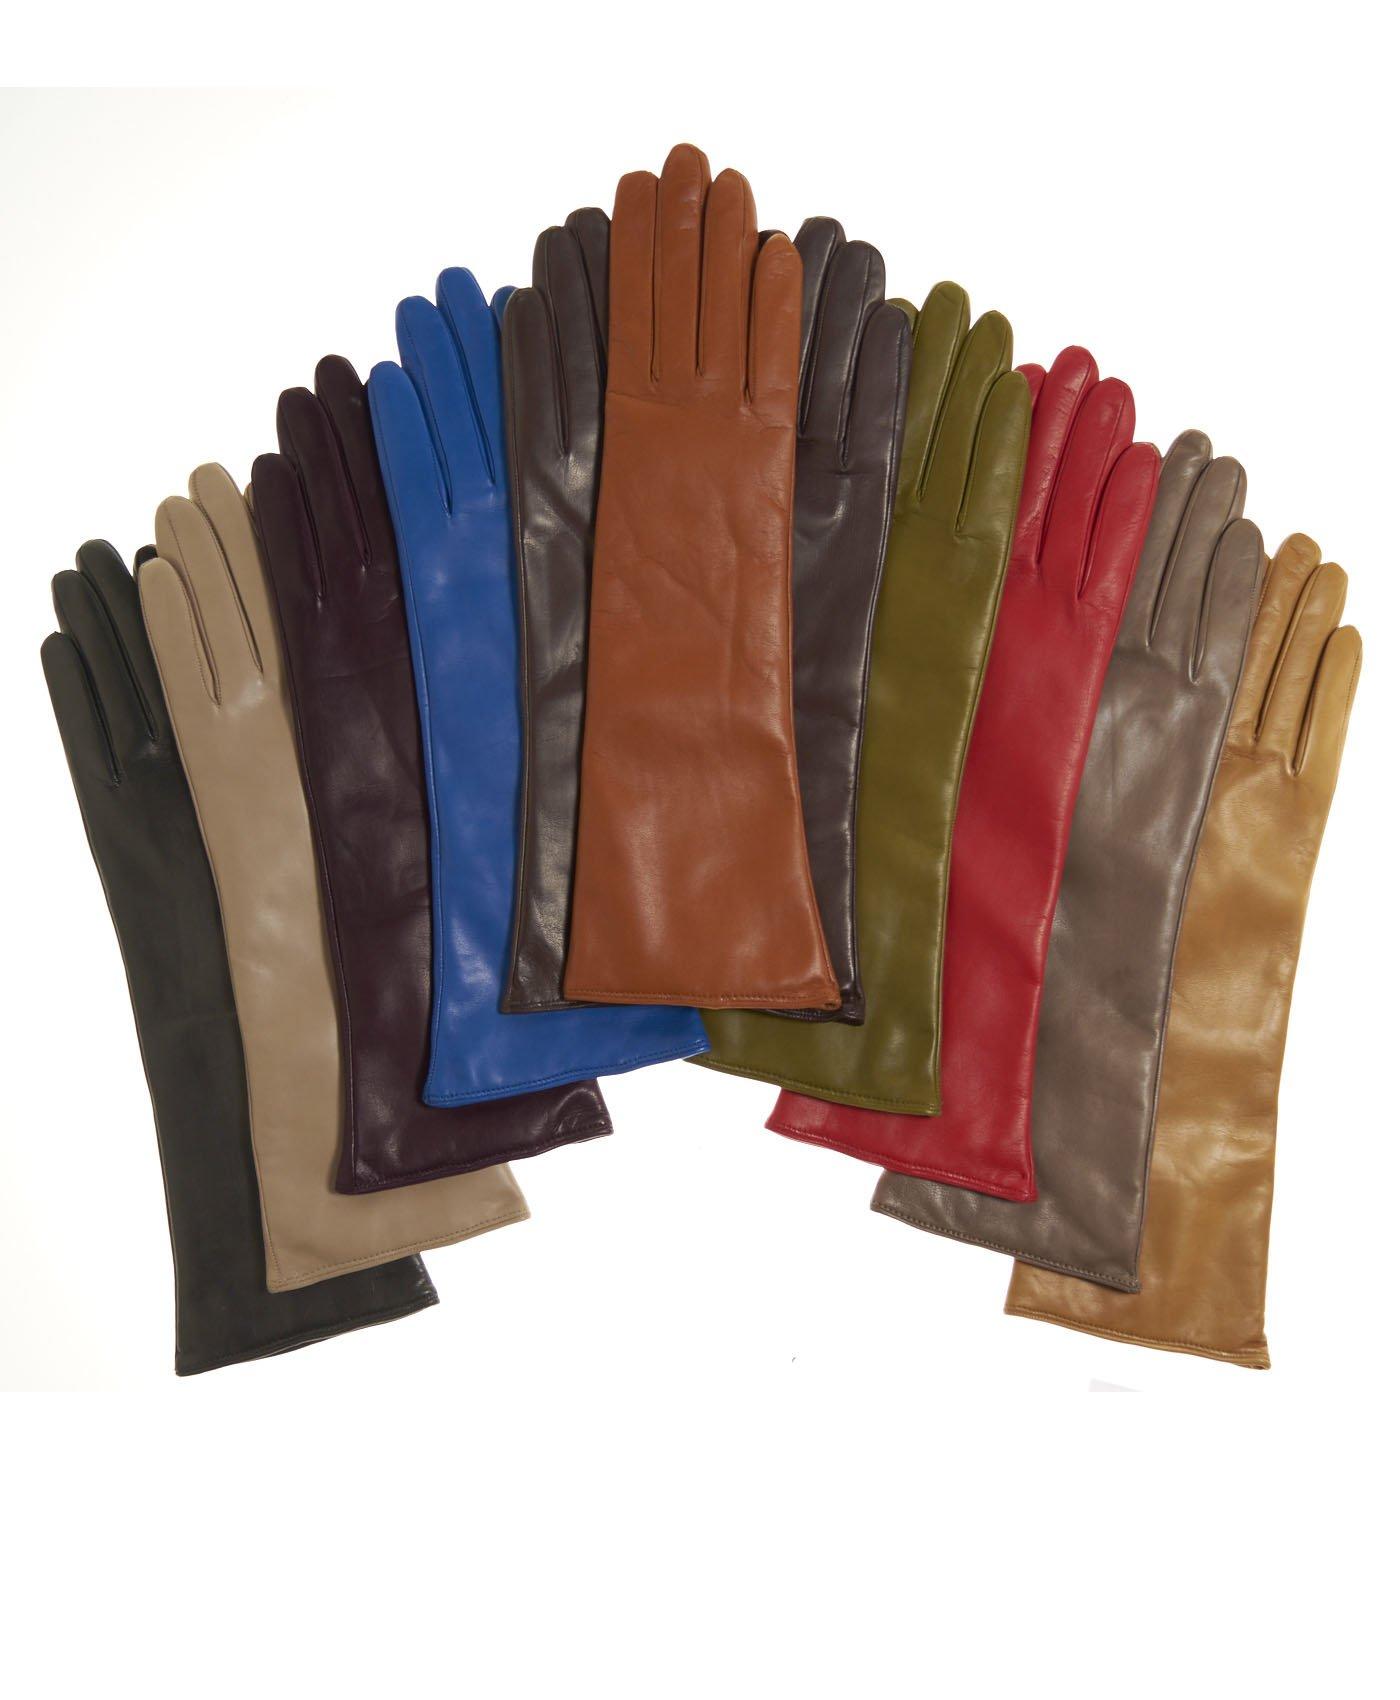 Fratelli Orsini Women's Italian''6 Button Length'' Cashmere Lined Leather Gloves Size 8 Color Black